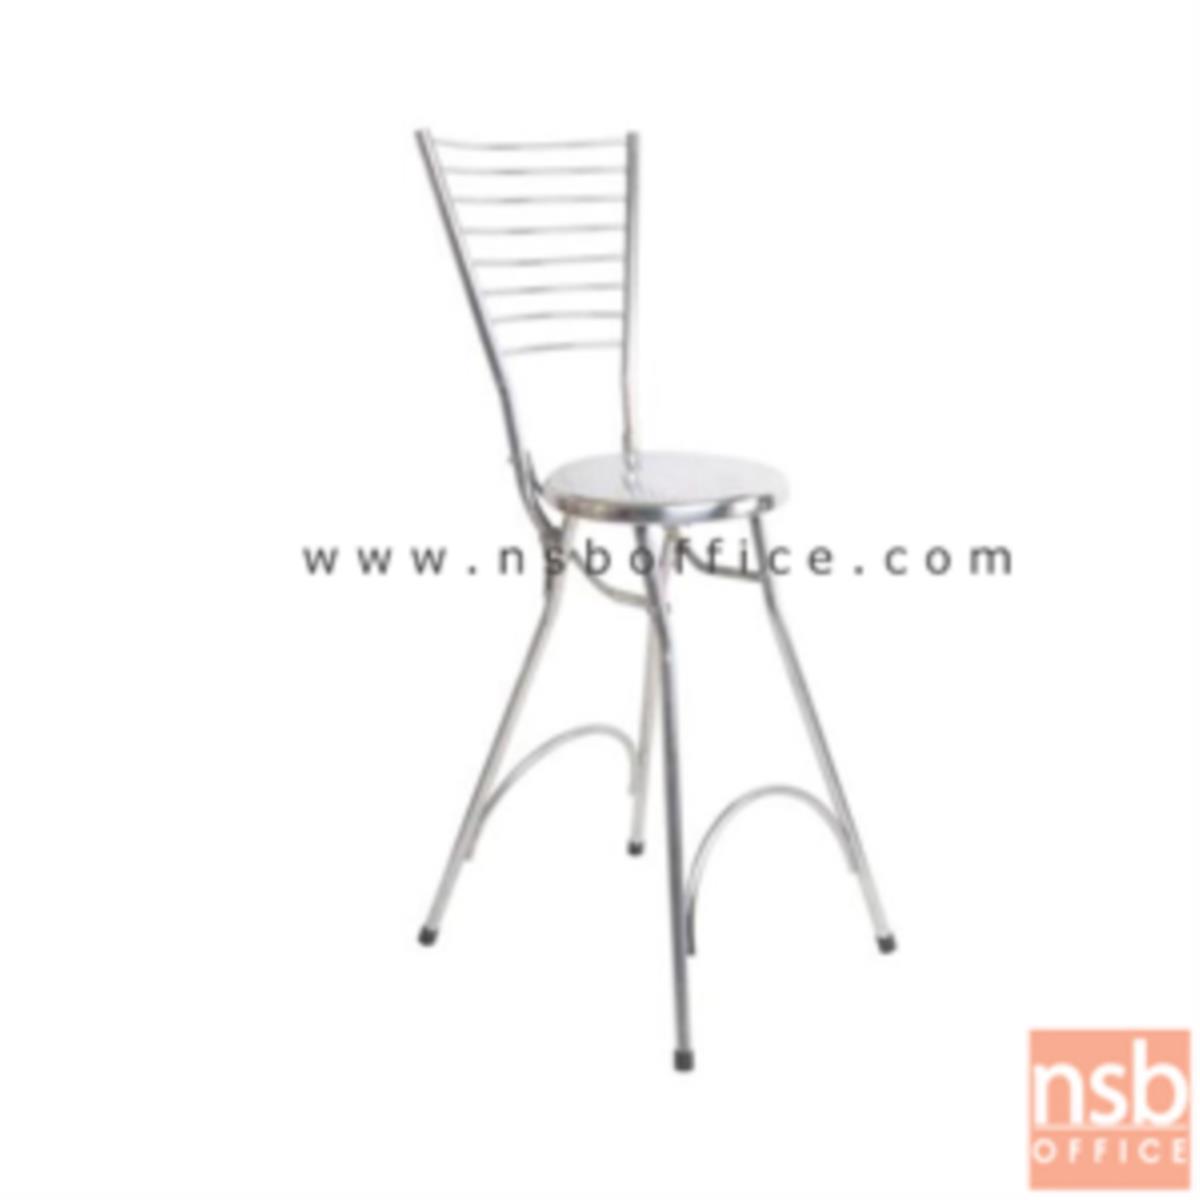 G12A097:เก้าอี้บาร์ที่นั่งกลม รุ่น Salvation (ซอลเวชั่น)  พร้อมจุกยางรองขา สเตนเลสล้วน